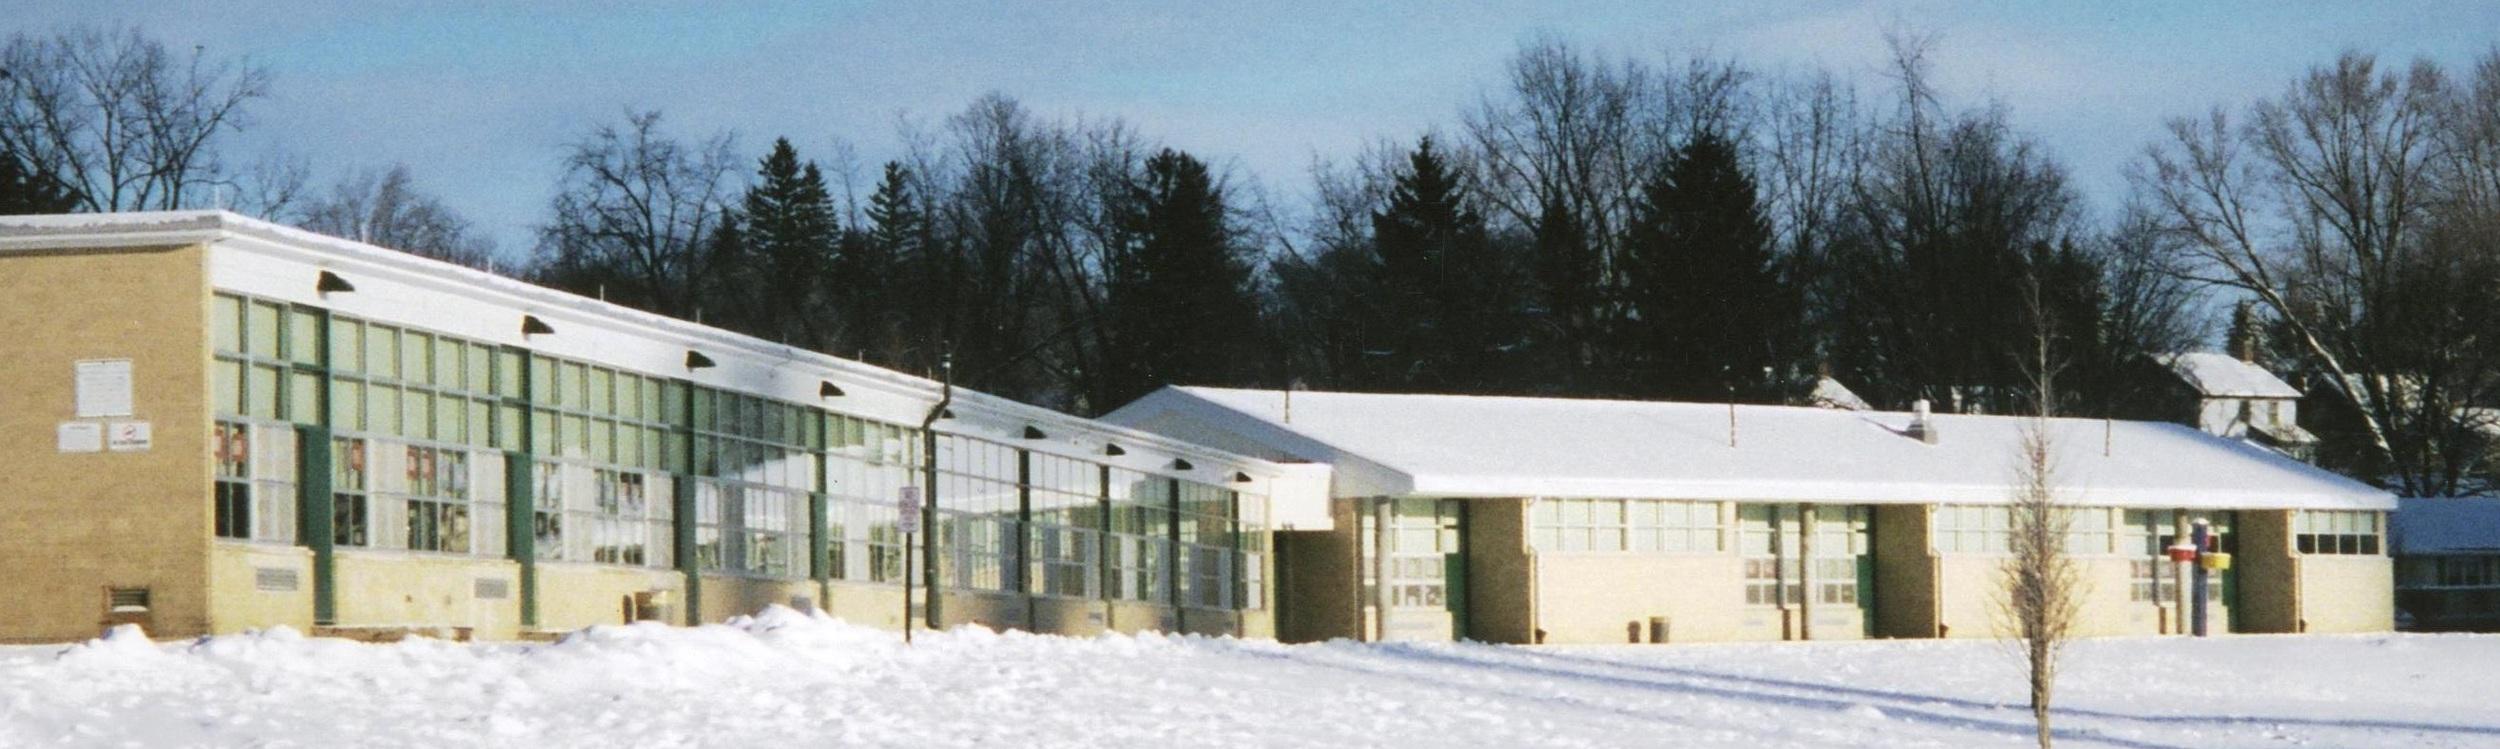 Allendale Elementary School, Pittsfield, Massachusetts